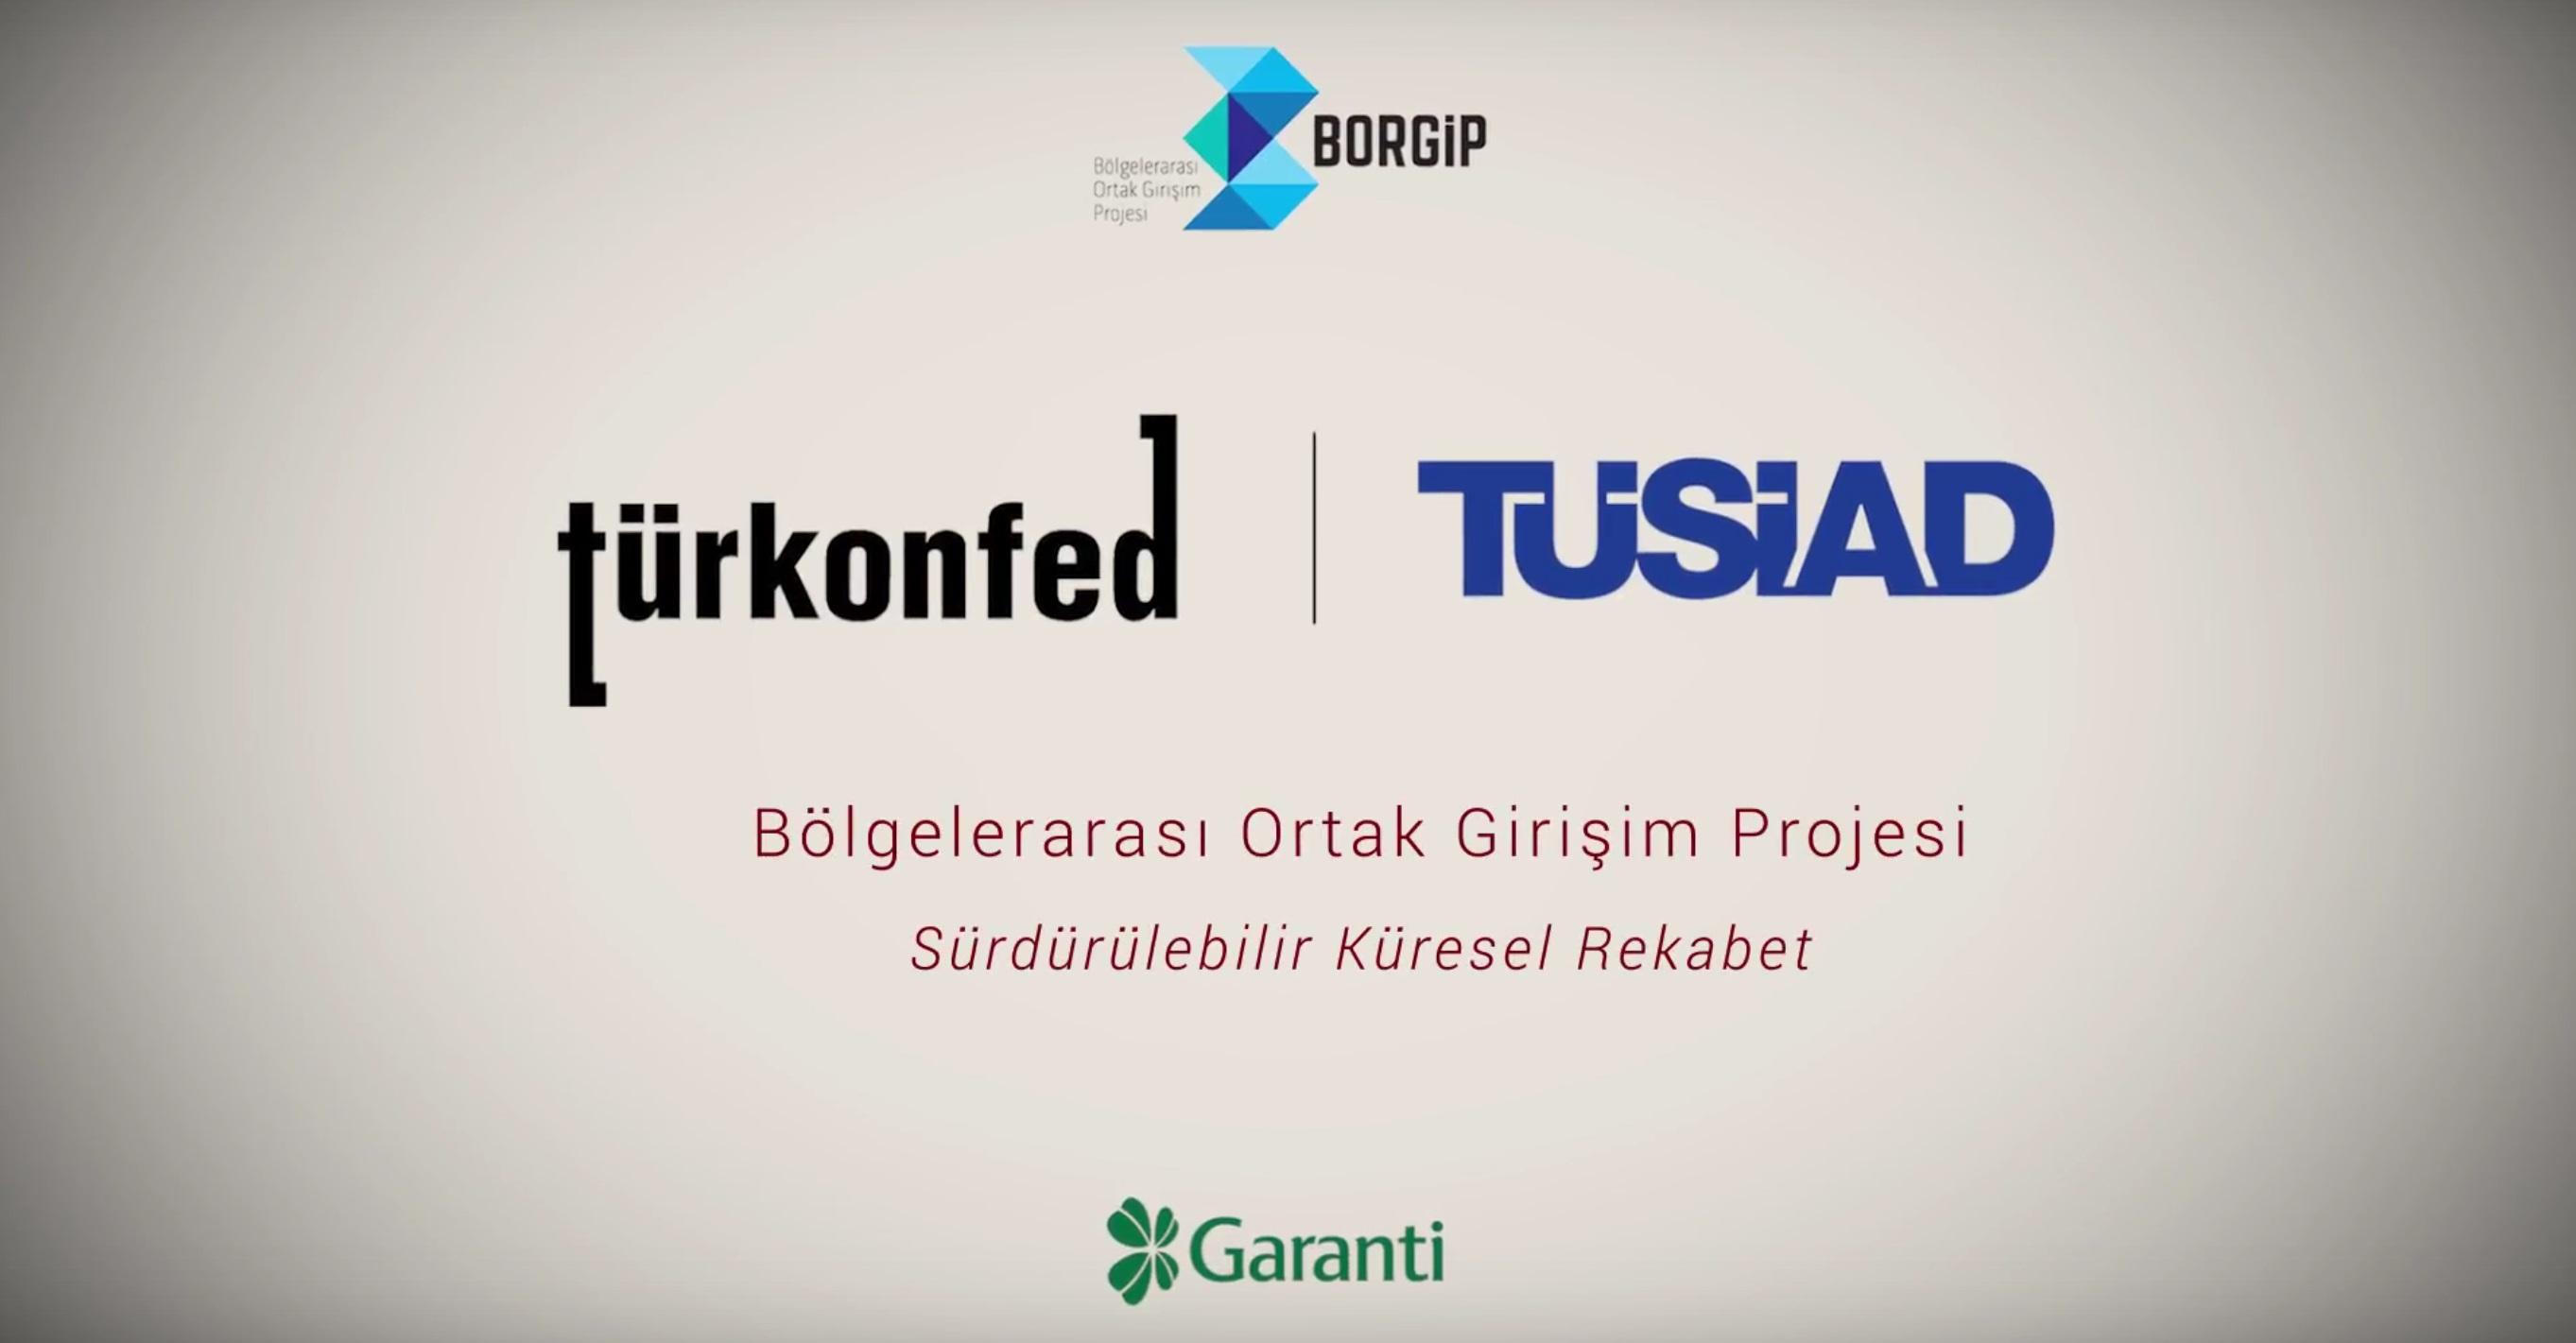 TÜRKONFED-TÜSİAD BORGİP Tanıtım Filmi 2-Sürdürülebilir Küresel Rekabet